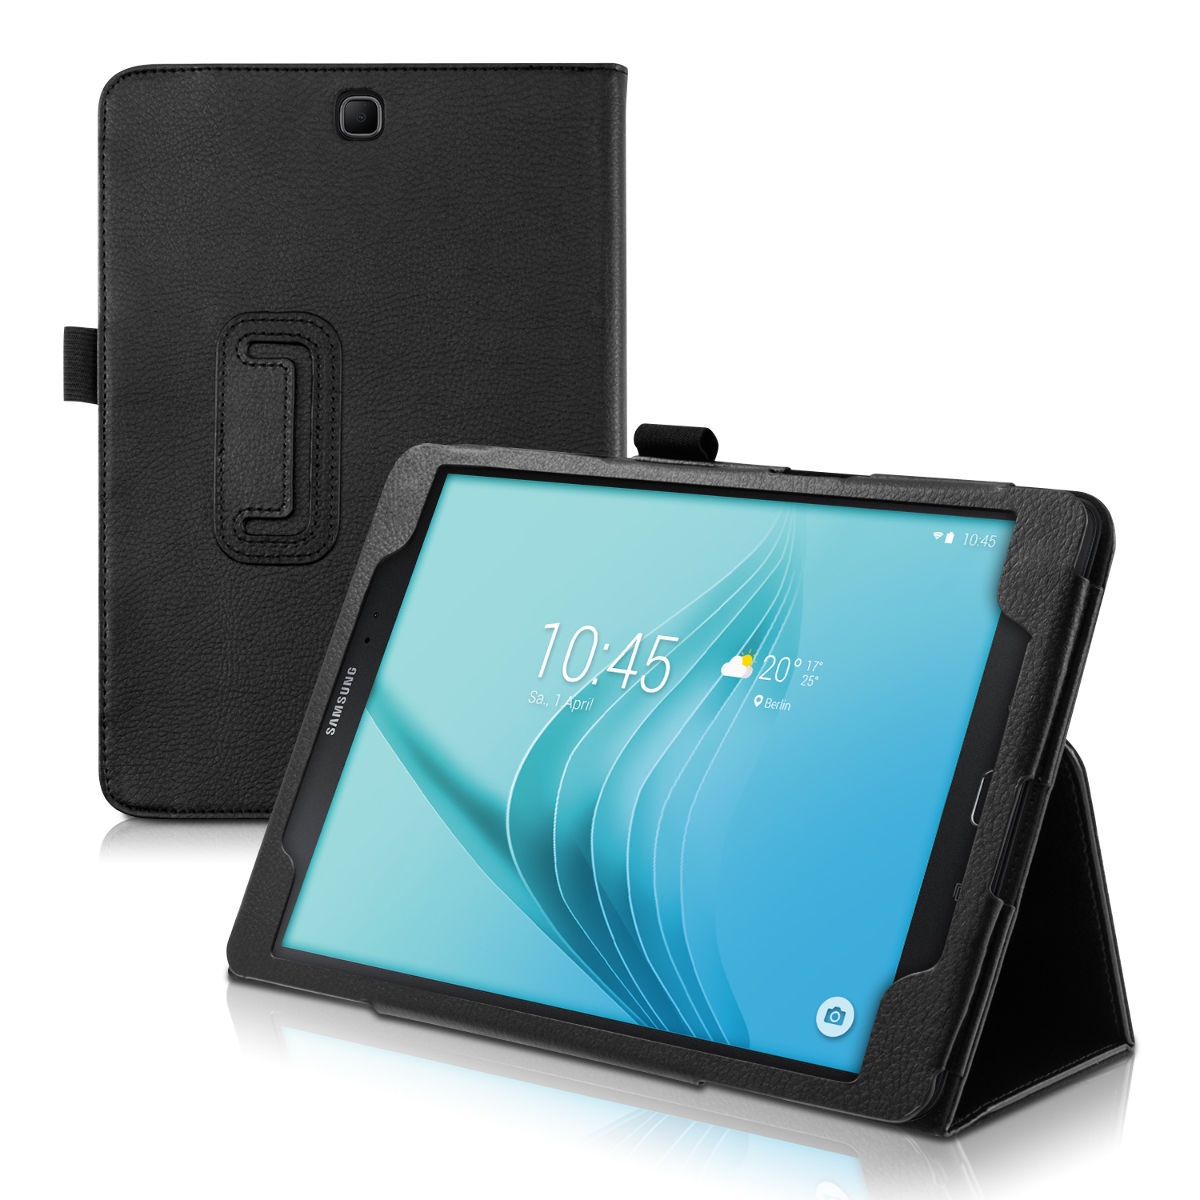 Pouzdro pro Samsung Galaxy Tab A 9.7 černé